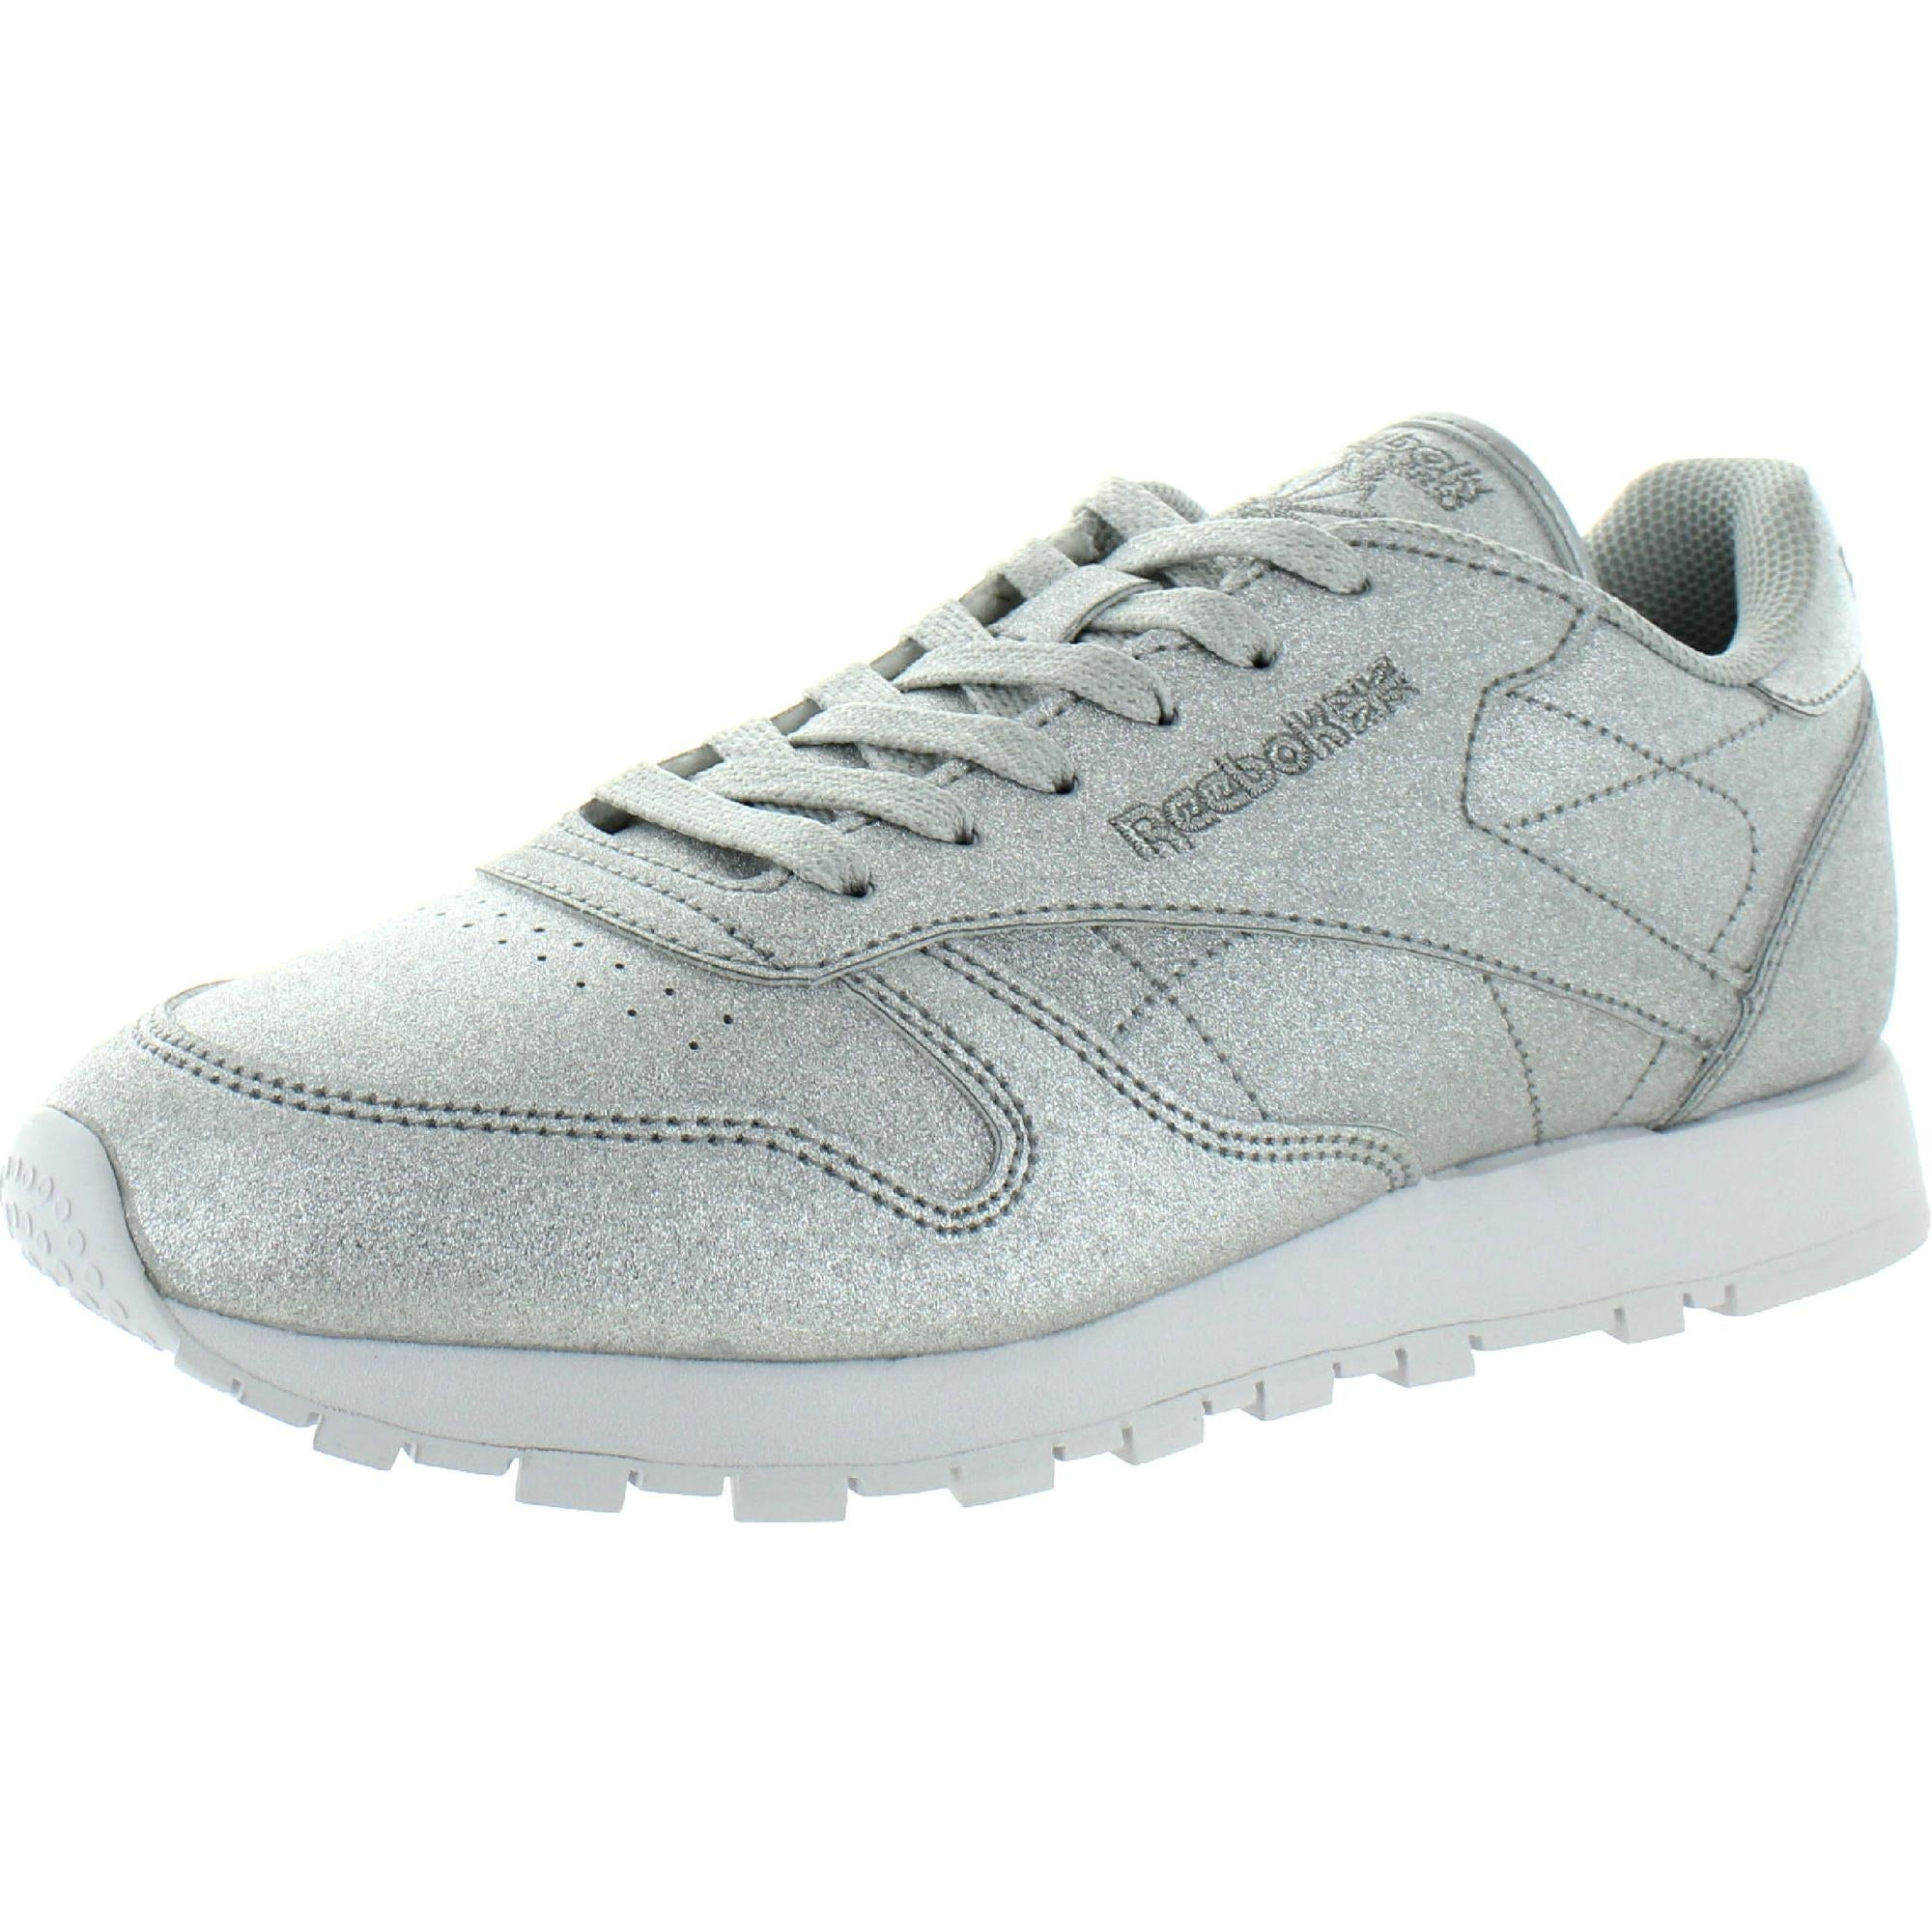 Síntomas Oso bomba  Reebok Womens Classic Sneakers Faux Leather Glitter - Diamond-Silver  Metallic/Gray/White - Overstock - 31735300 - 9 Medium (B,M)